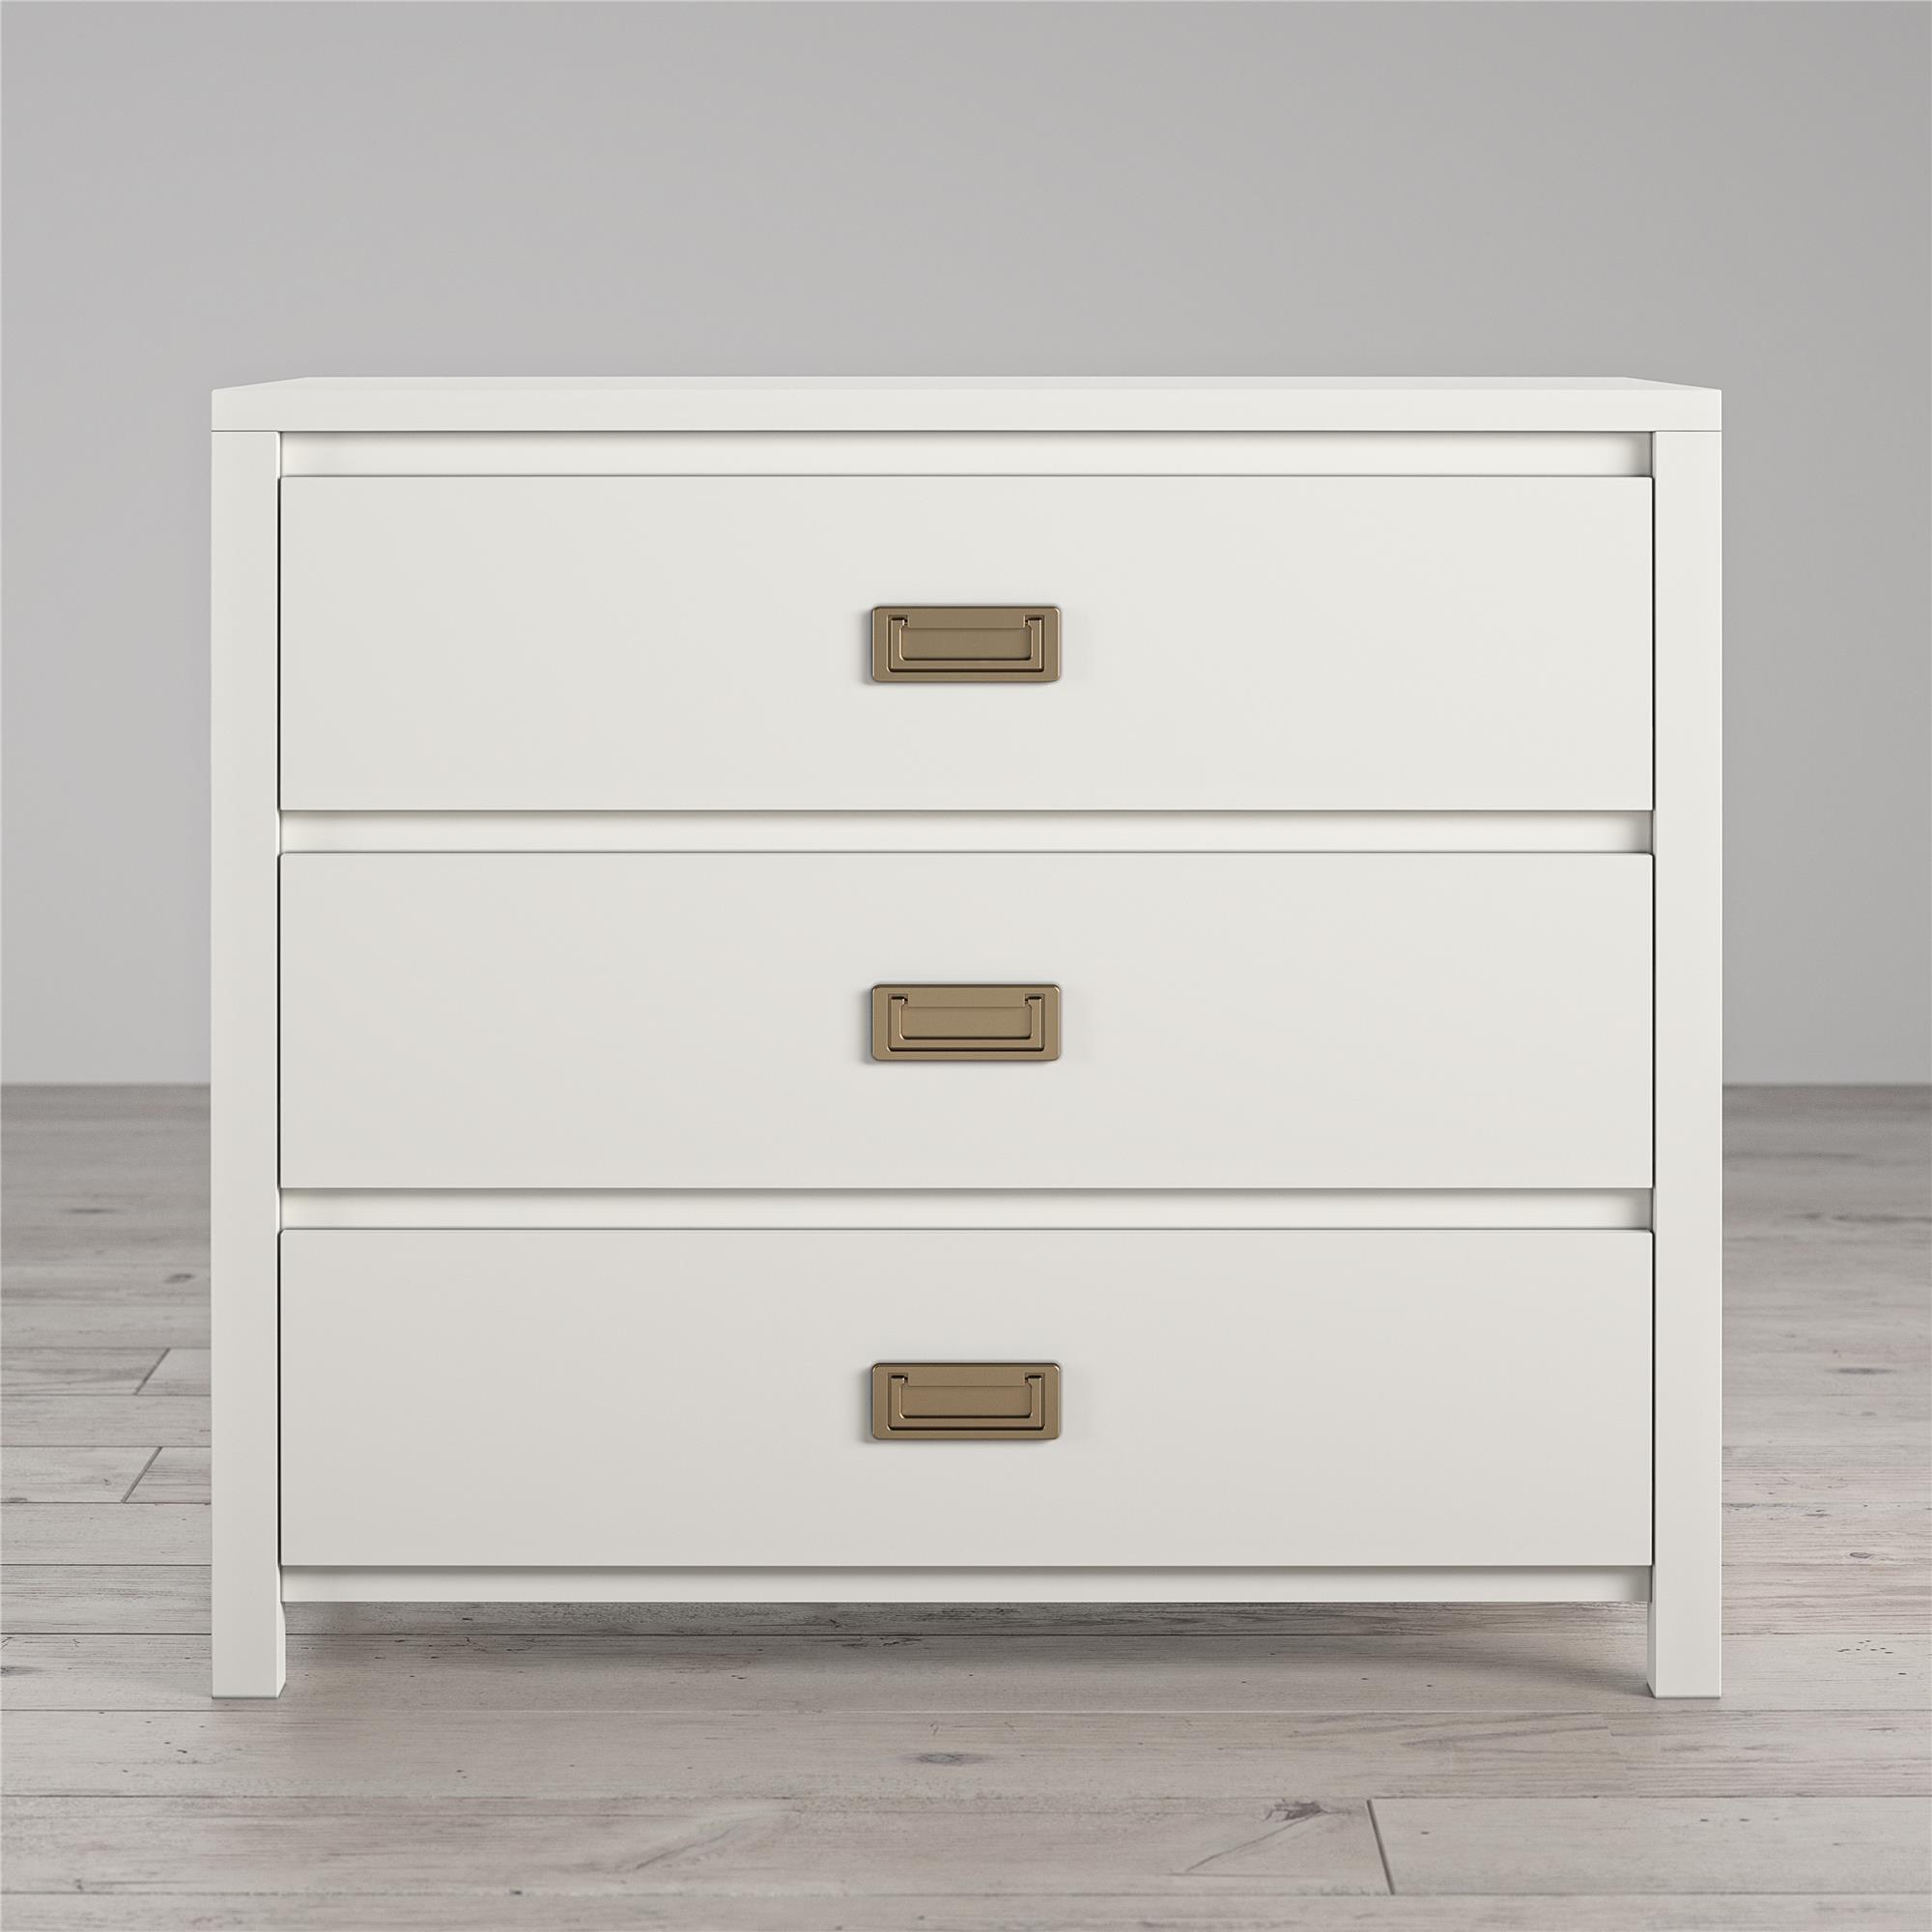 neutral bedroom furniture ideas